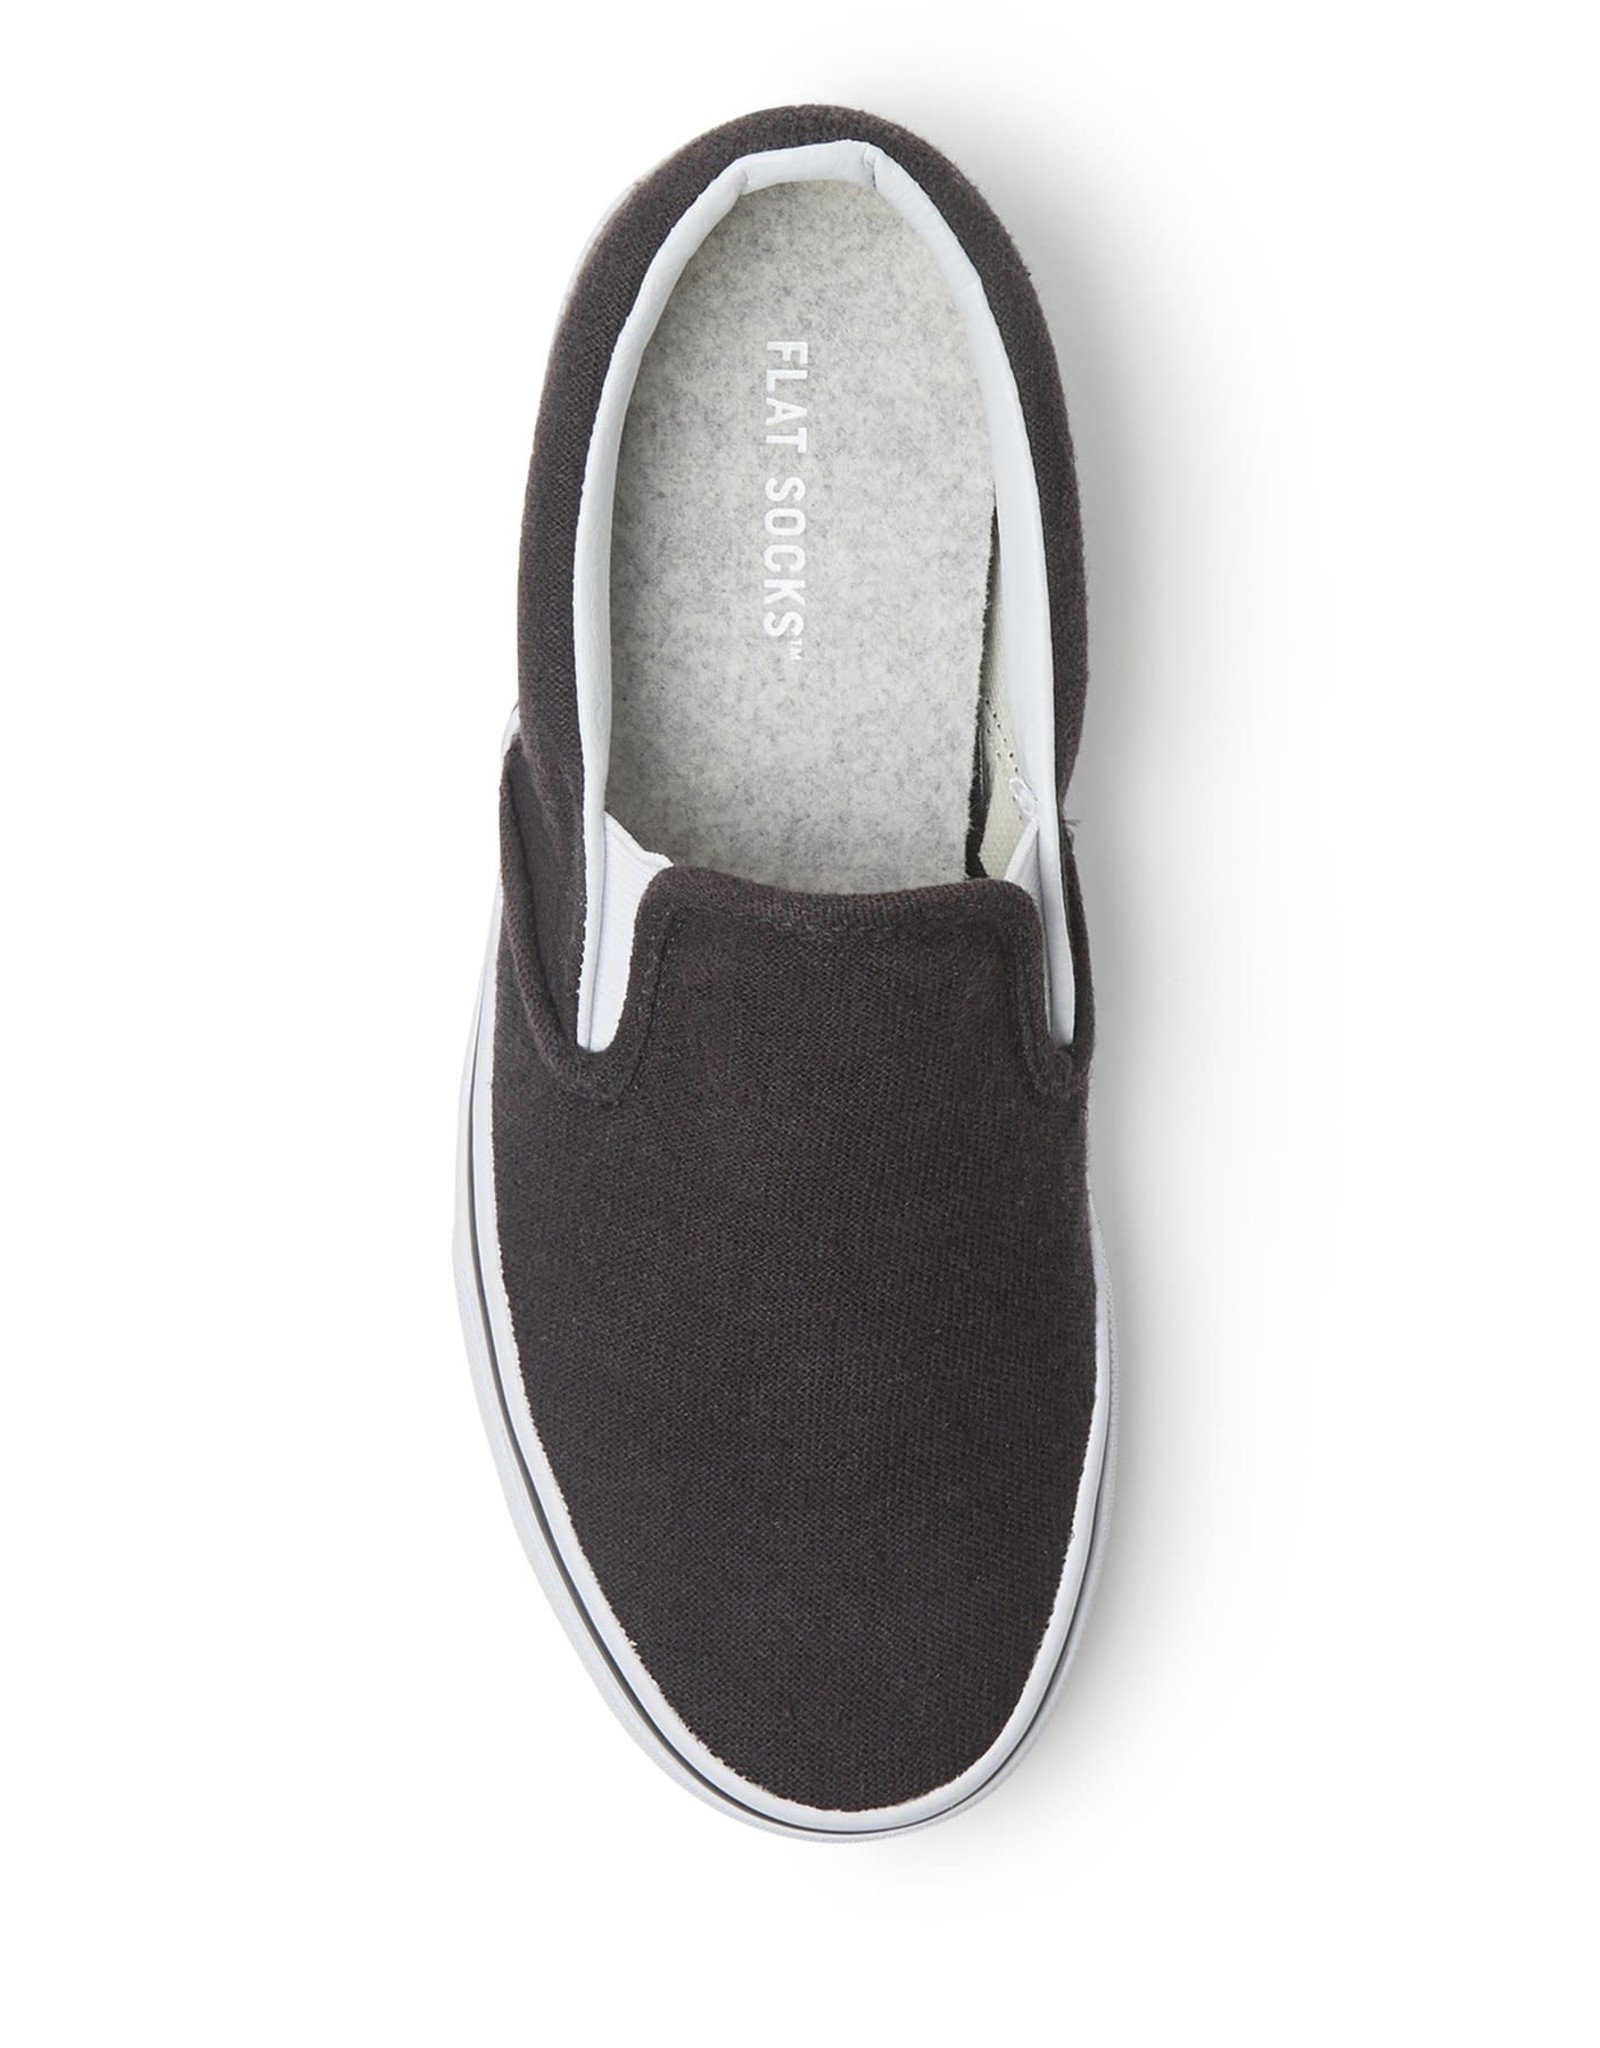 - Light Heather Grey Flat Socks